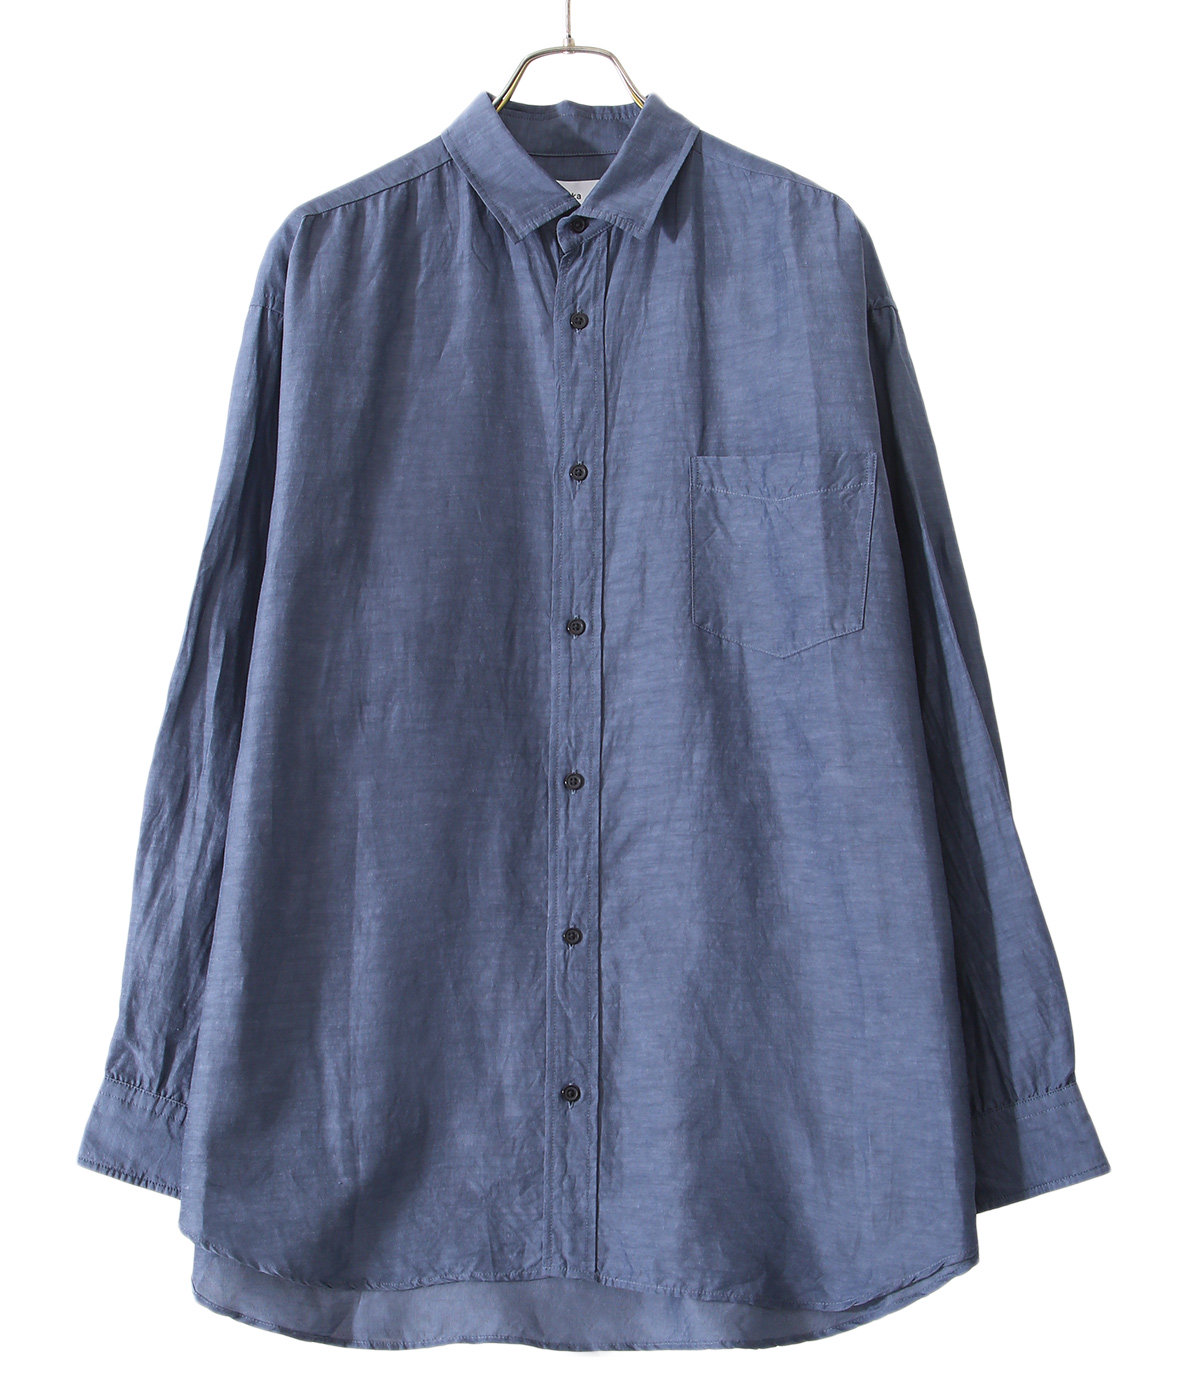 【ONLY ARK】別注 WIDE FIT SHIRT - cu/li/co cloth -